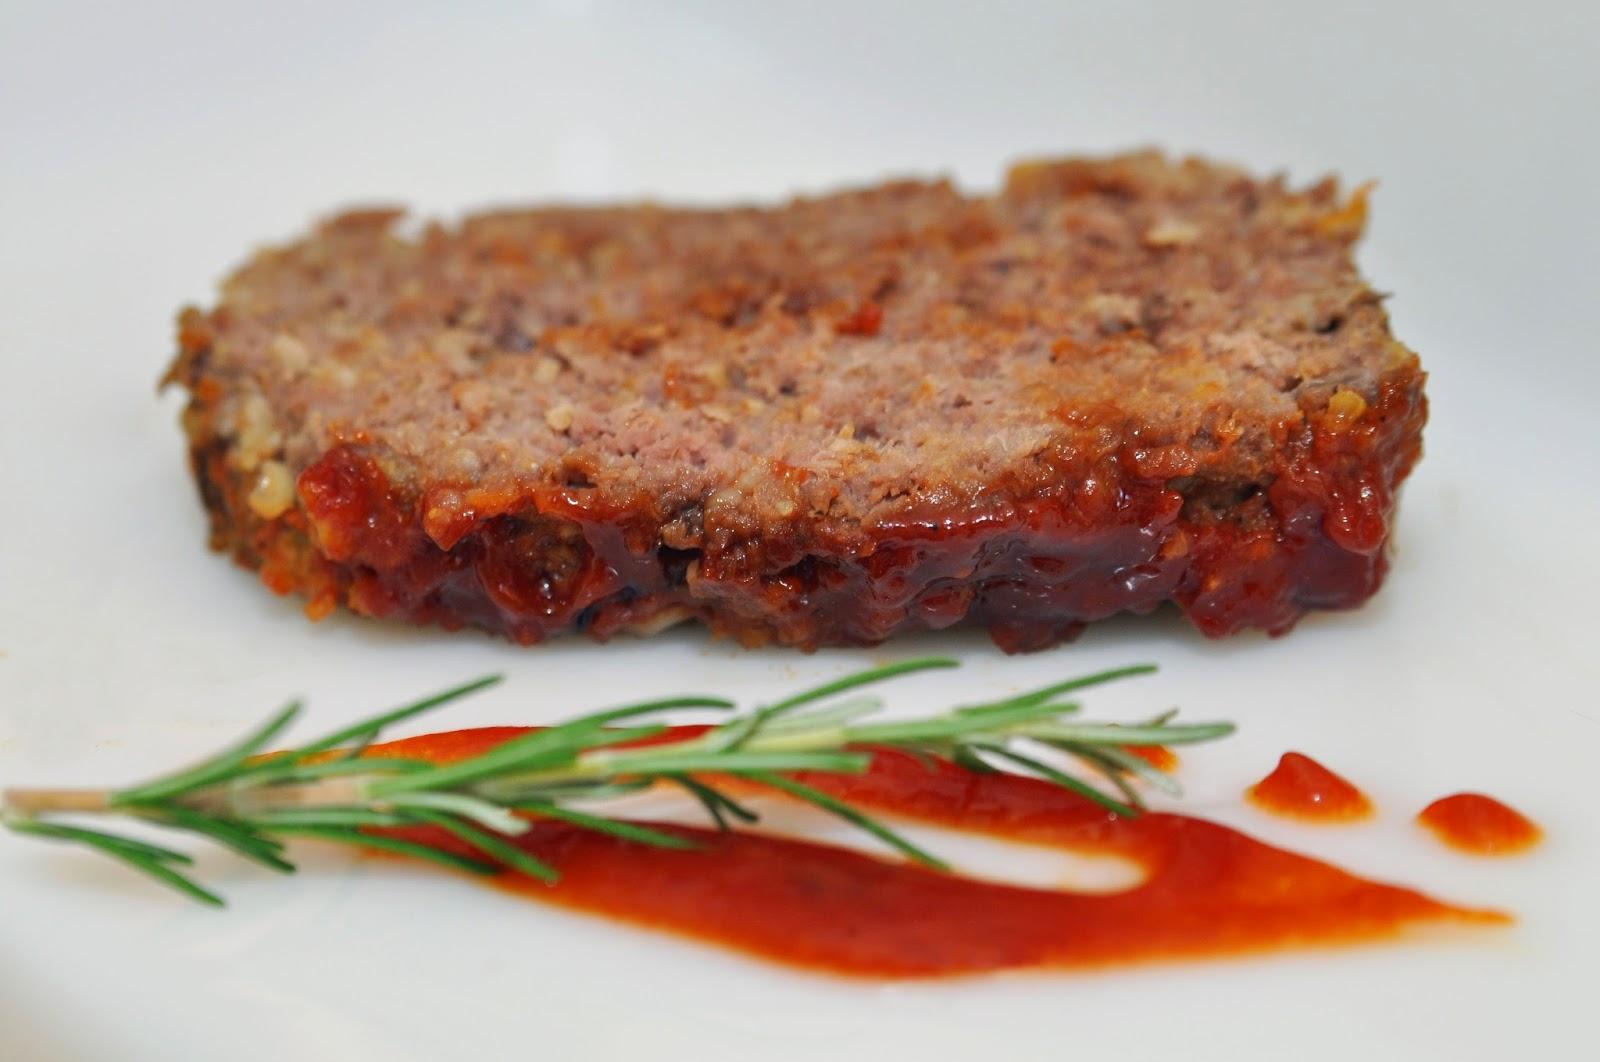 Gallerphot Quaker Oats Meatloaf Recipe